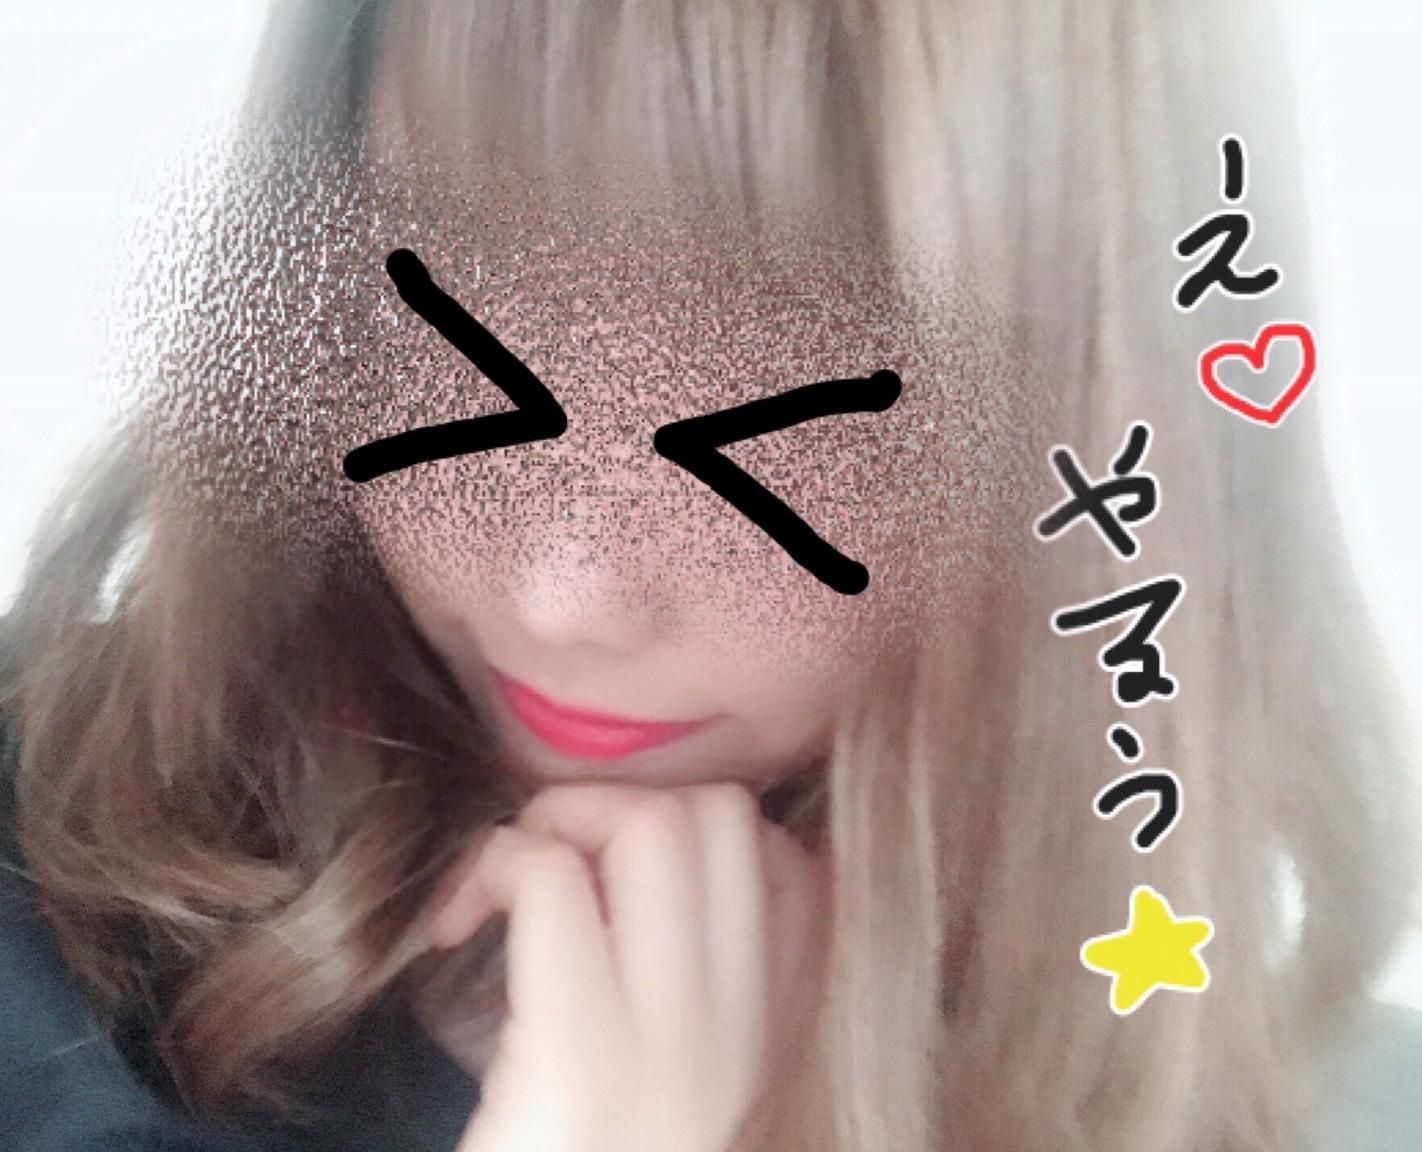 S__38314002.jpg